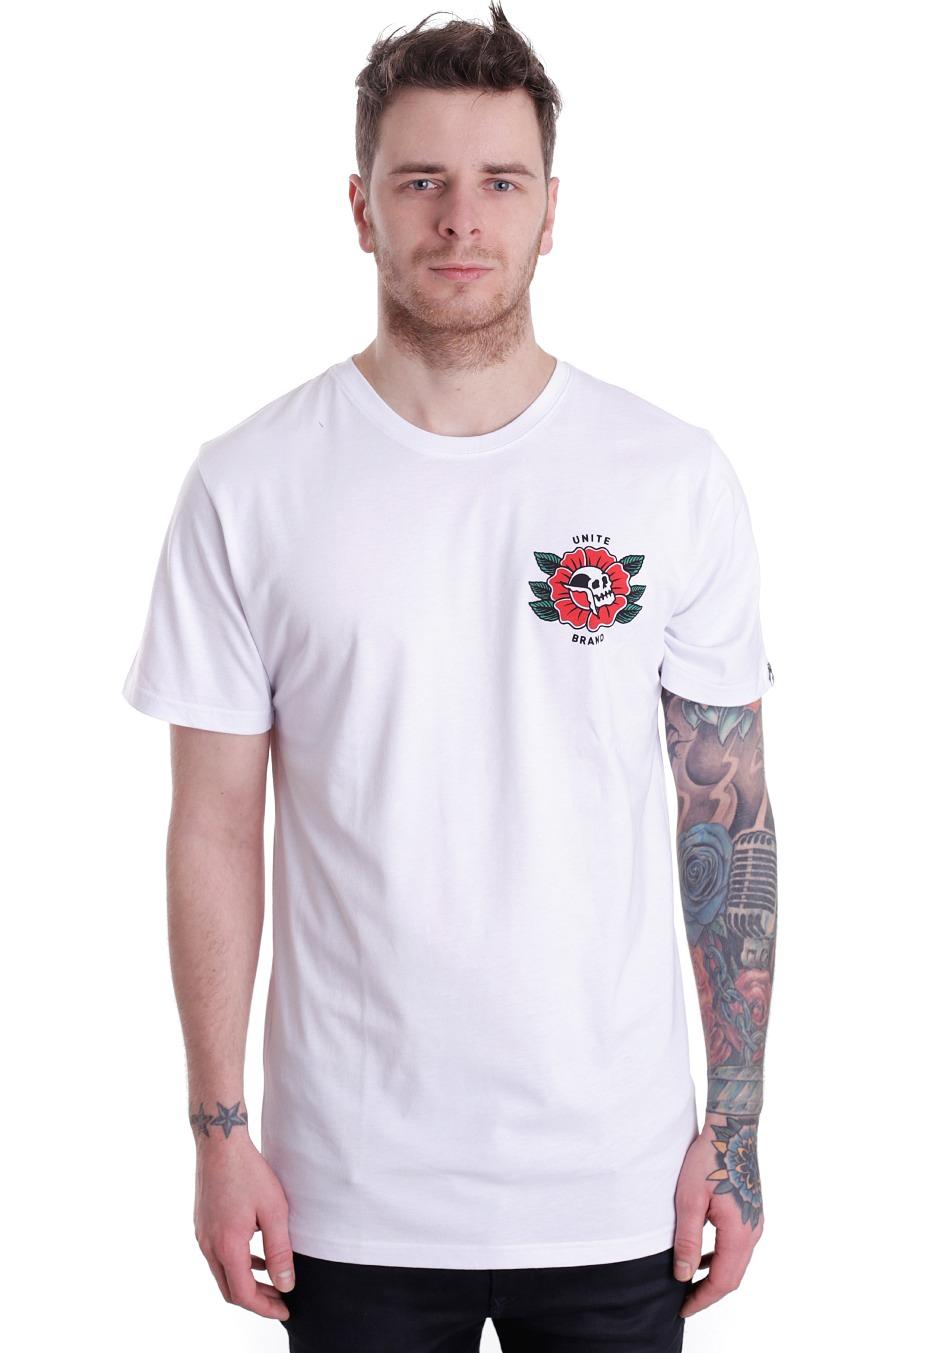 ab5fce59281e Unite Clothing - Dedication White - T-Shirt - Streetwear Shop -  Impericon.com AU